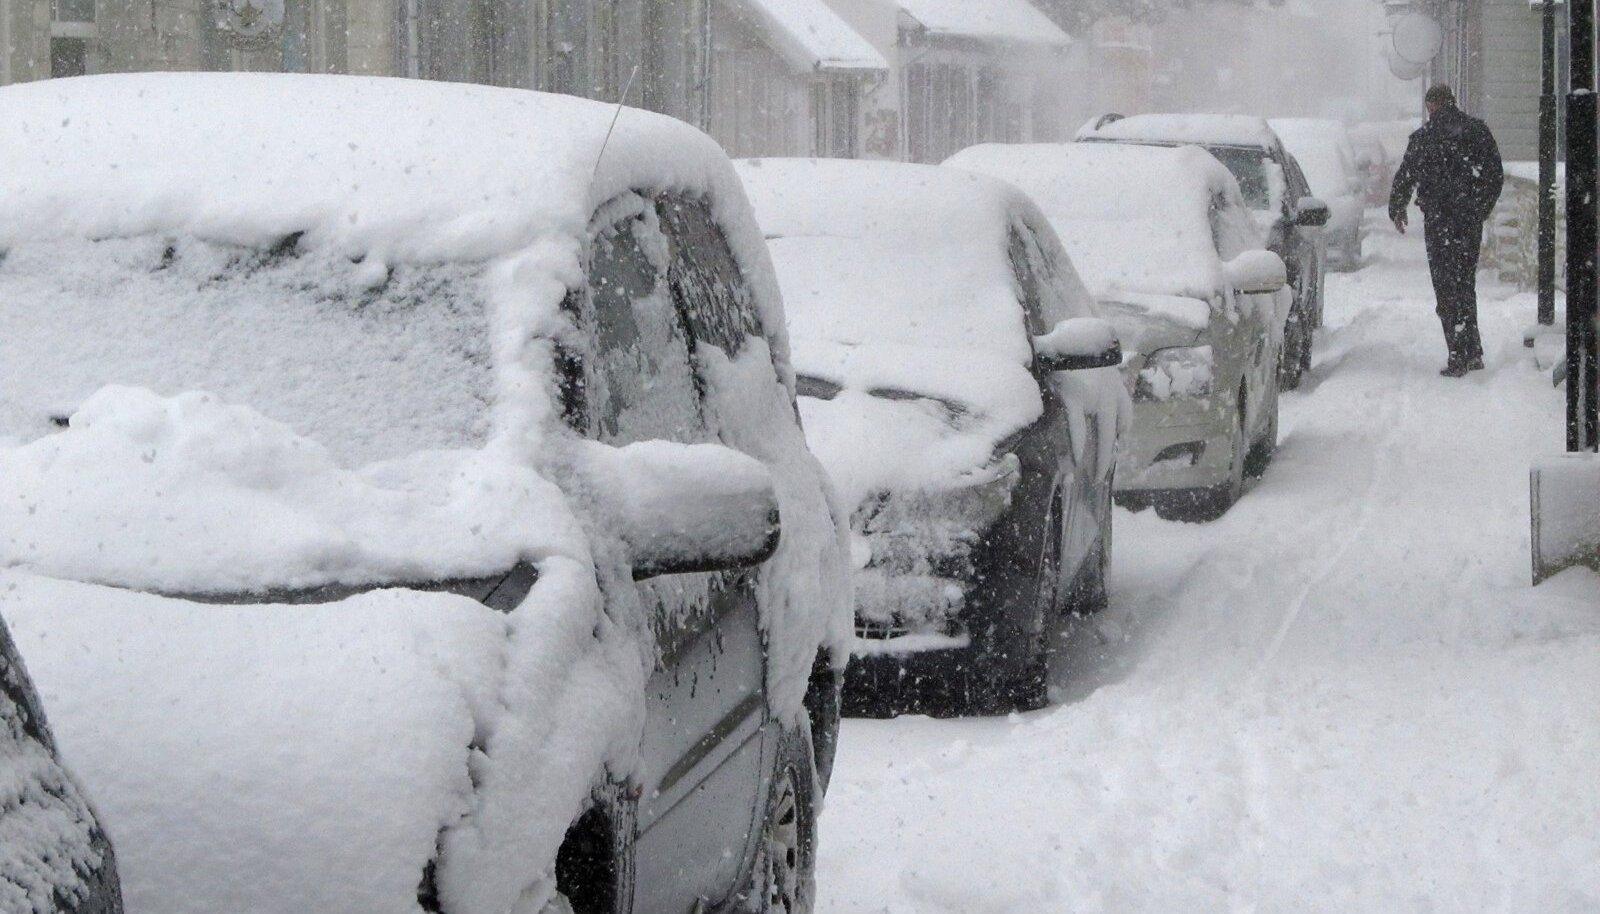 Saaremaal sadas maha paks lumi